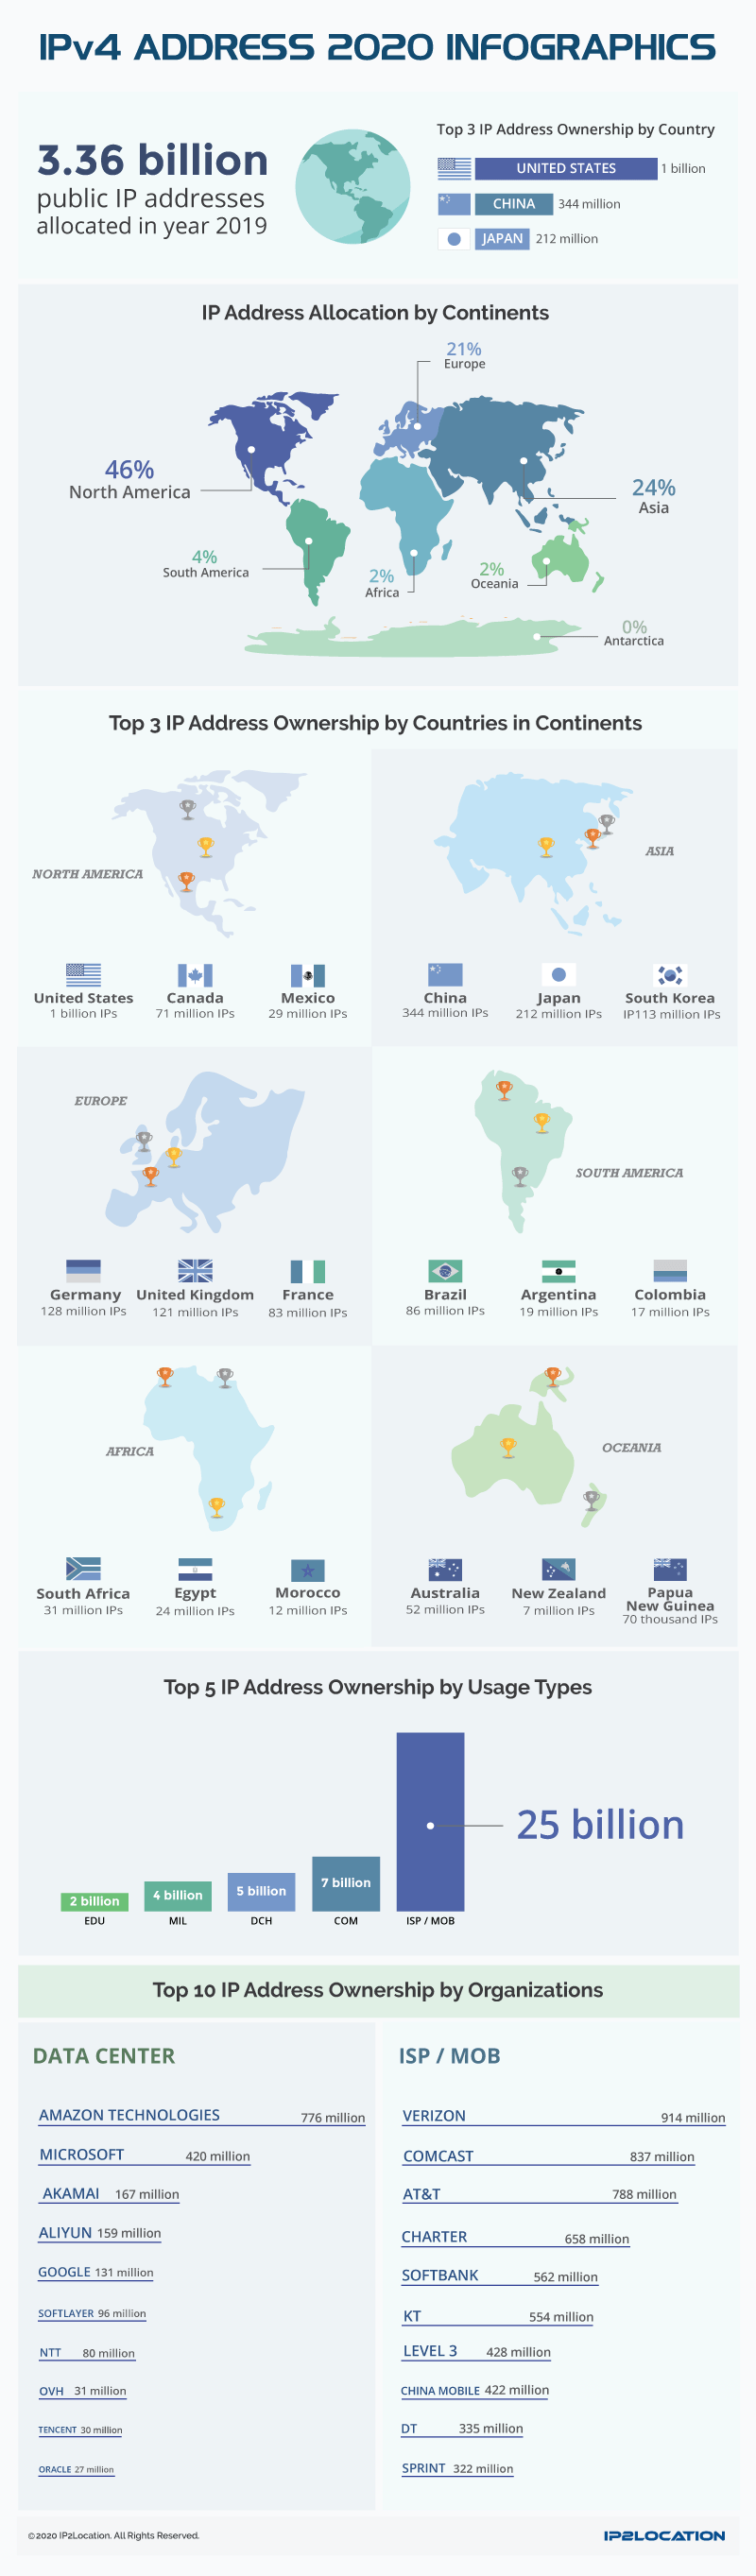 IPv4 Address 2020 Infographics